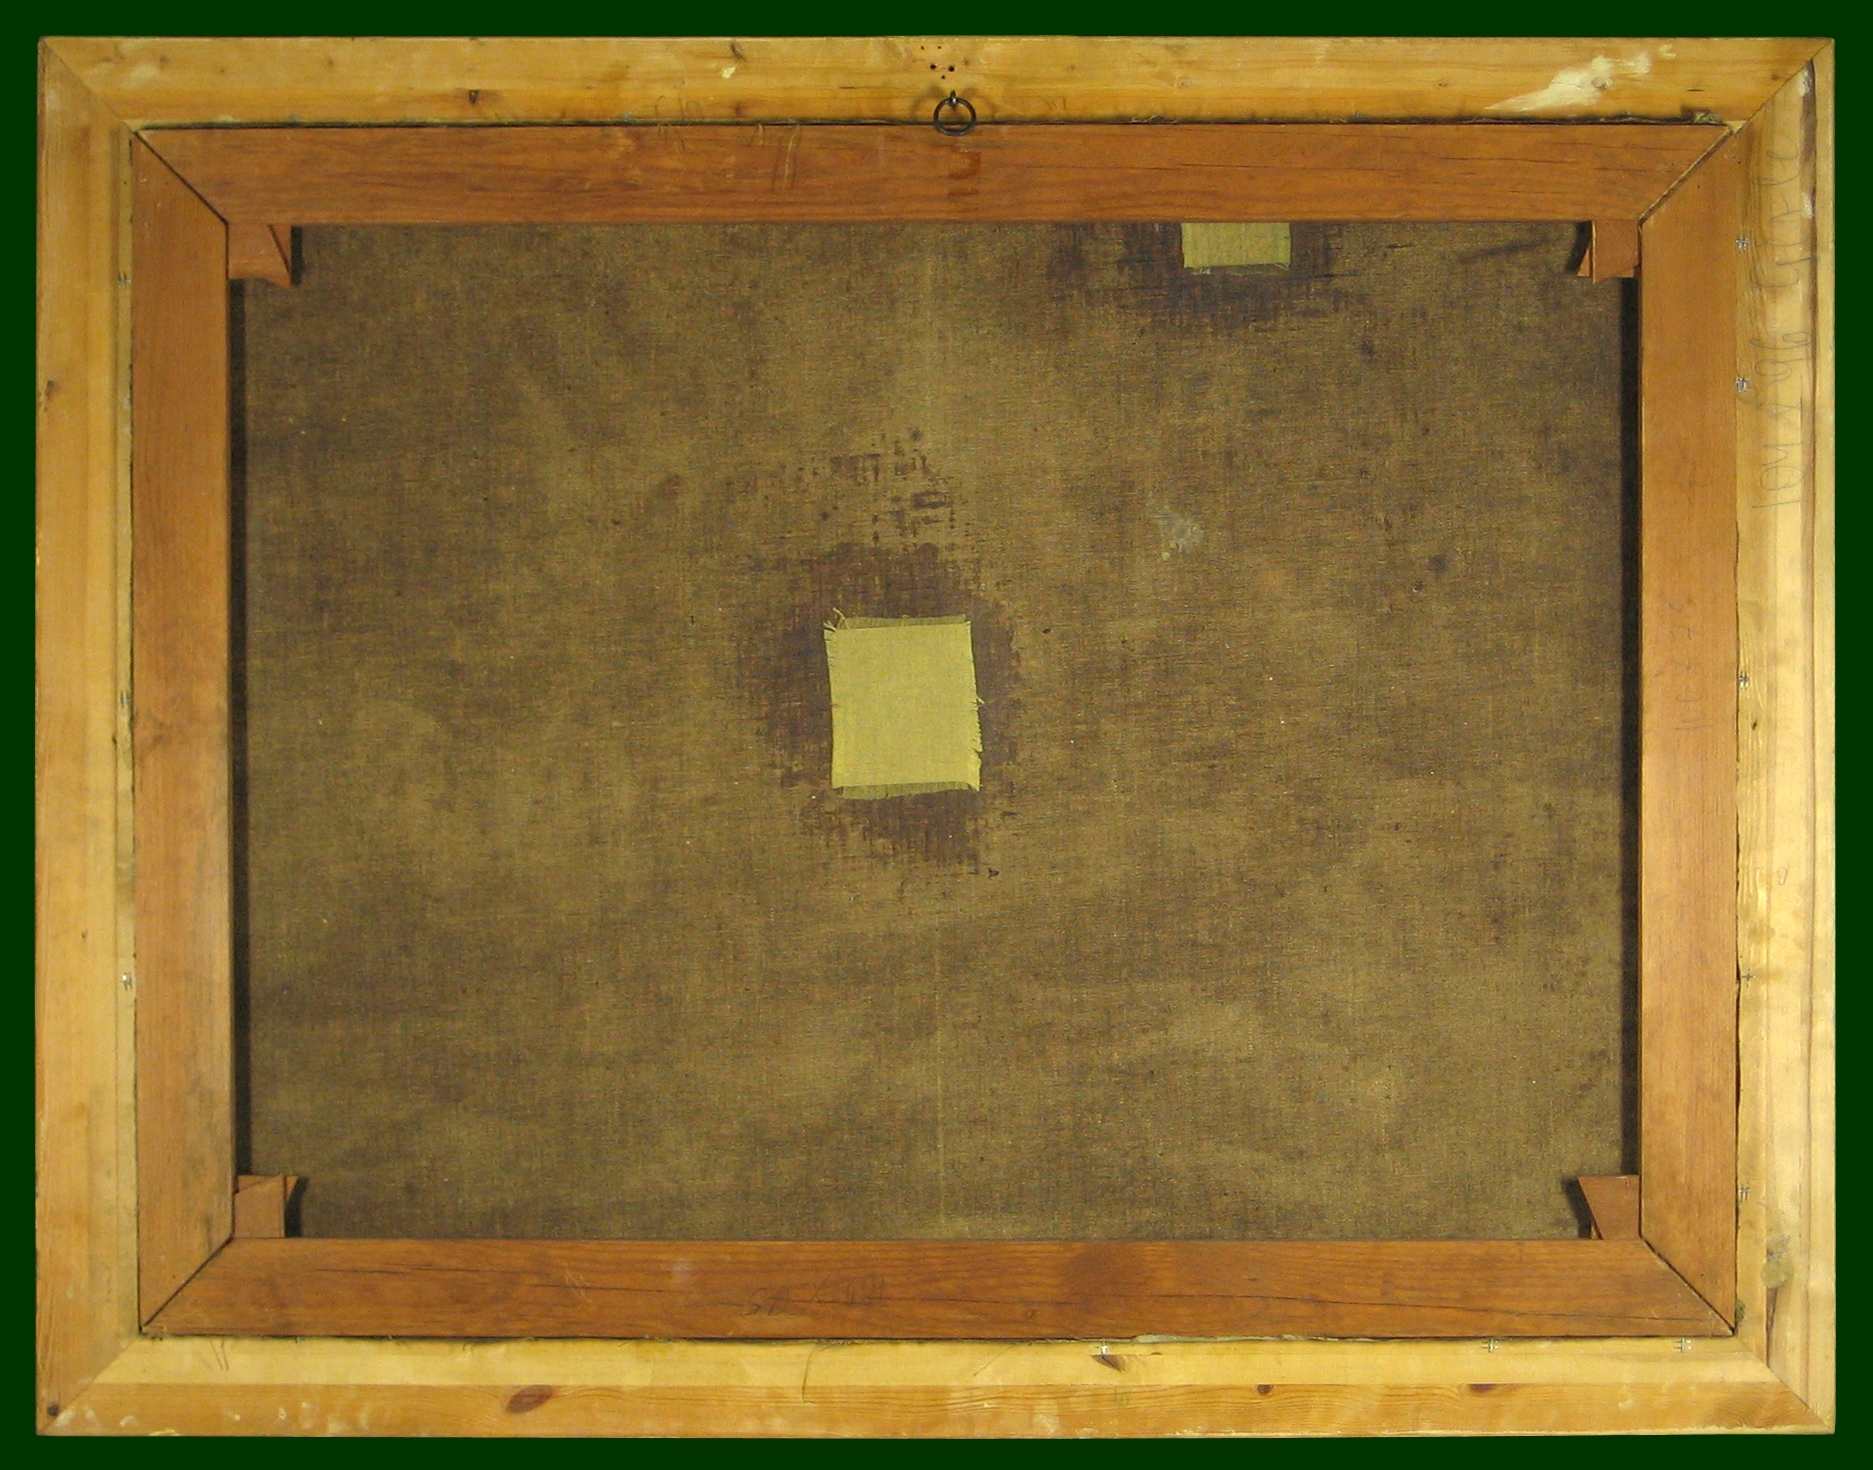 91-4h_t.jpg (1873×1470)